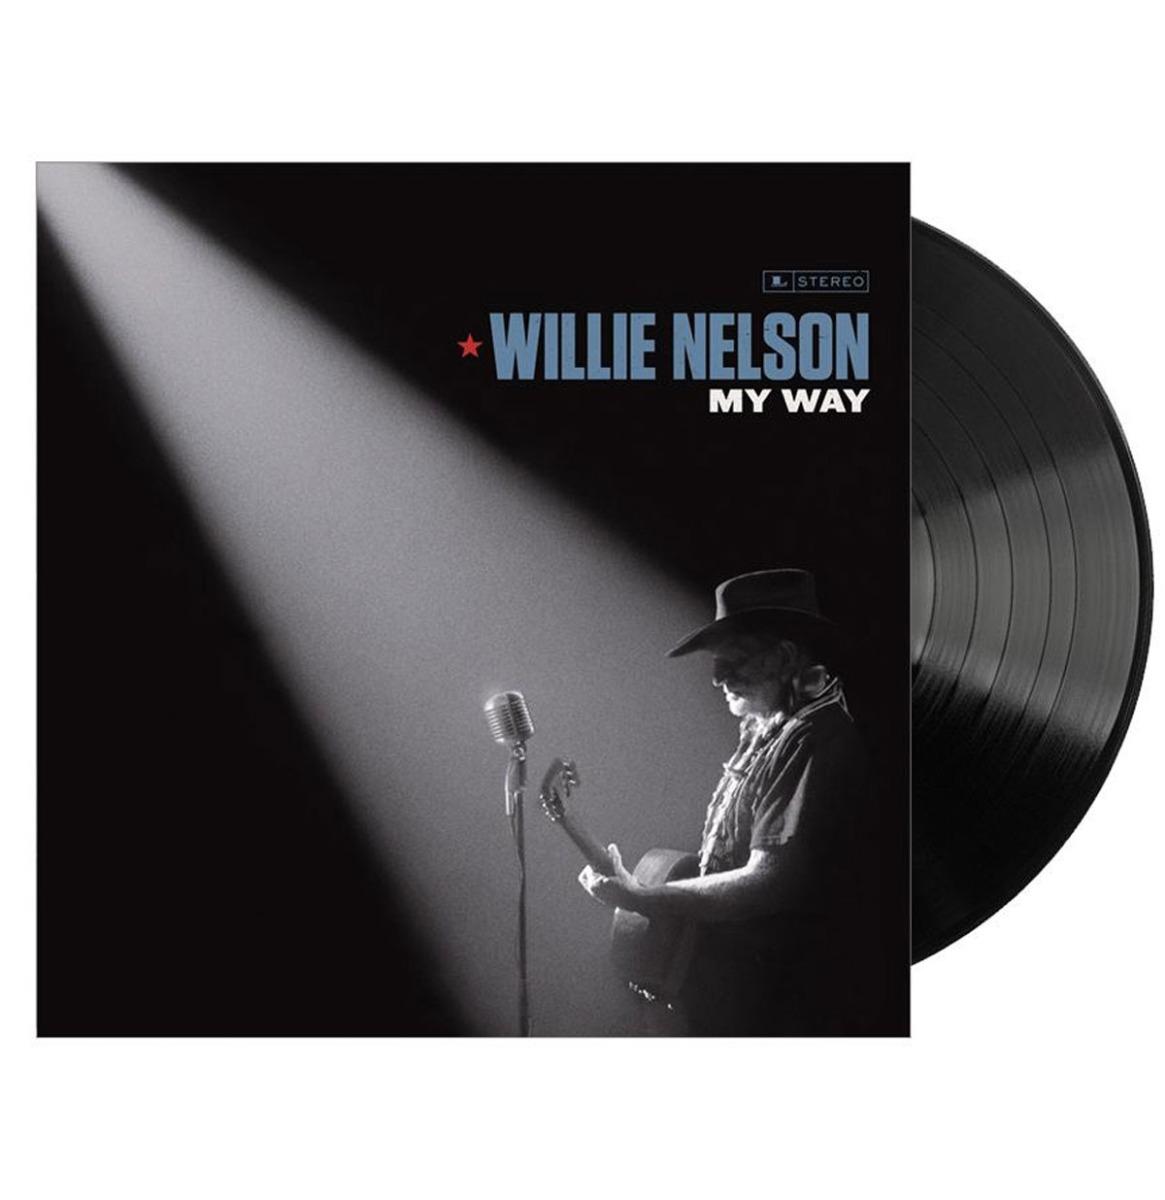 Willie Nelson - My Way (Sings Frank Sinatra) LP